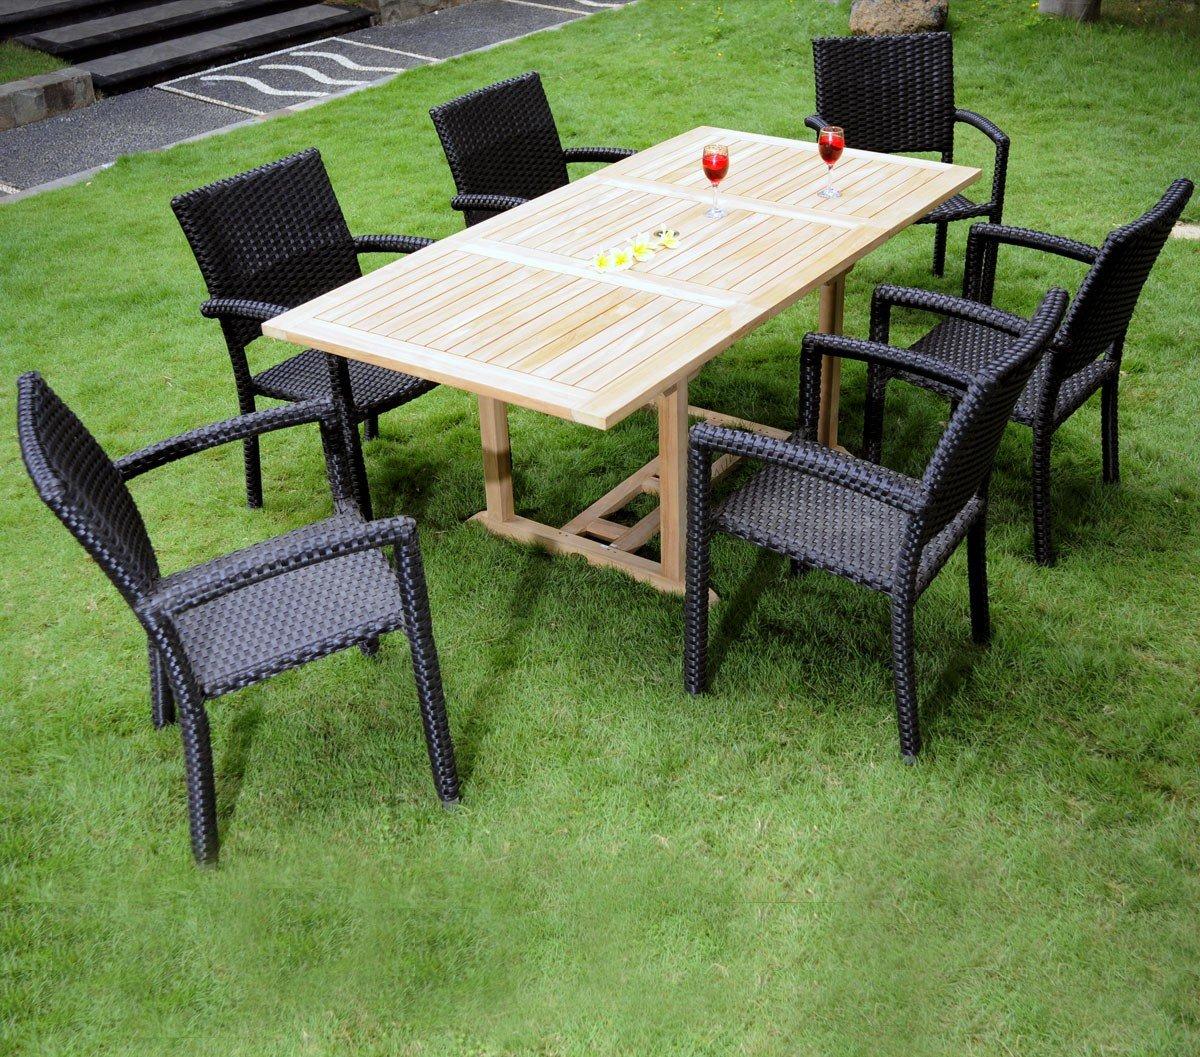 Gartenmöbel, Sitzgruppe Gartenstuhl aus Teak Limbok, roh